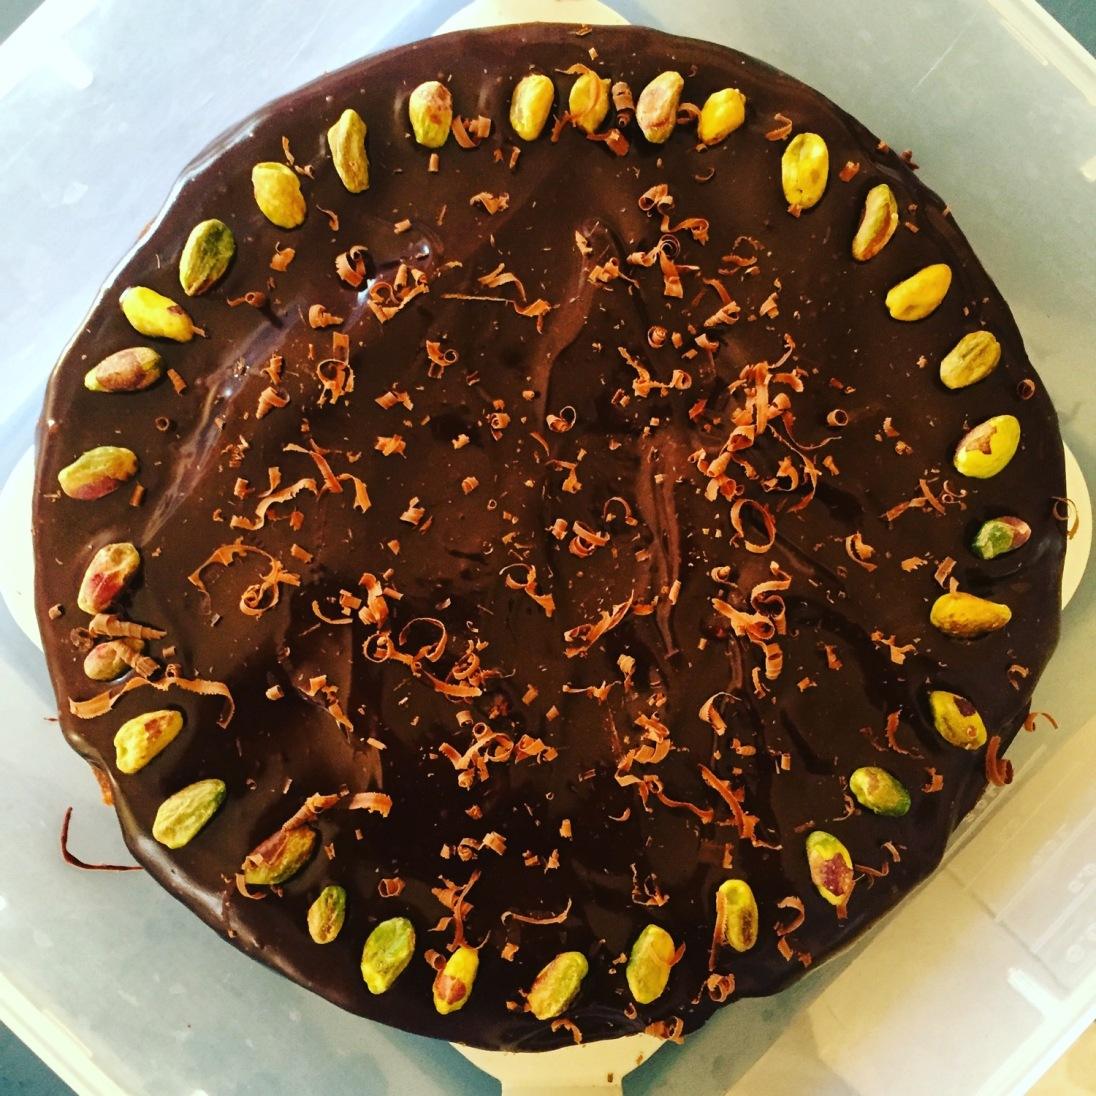 Cake 2: Pistachio and chocolate